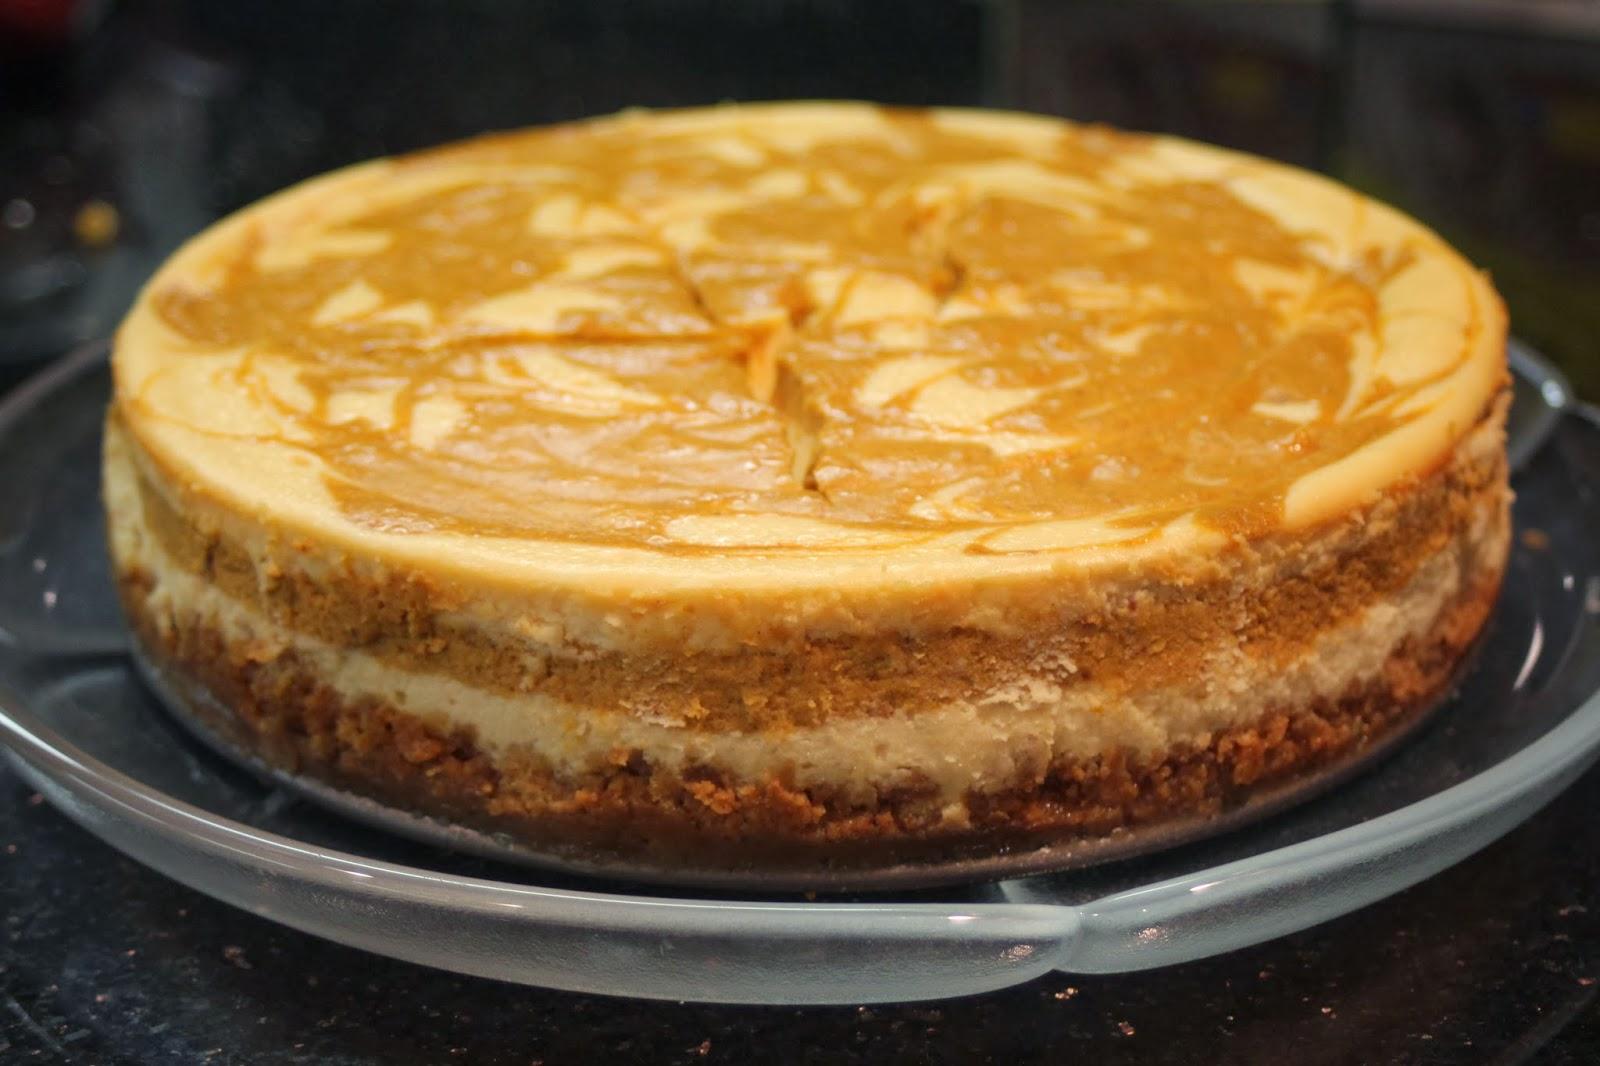 Julie Bakes: Spiced pumpkin swirl cheesecake